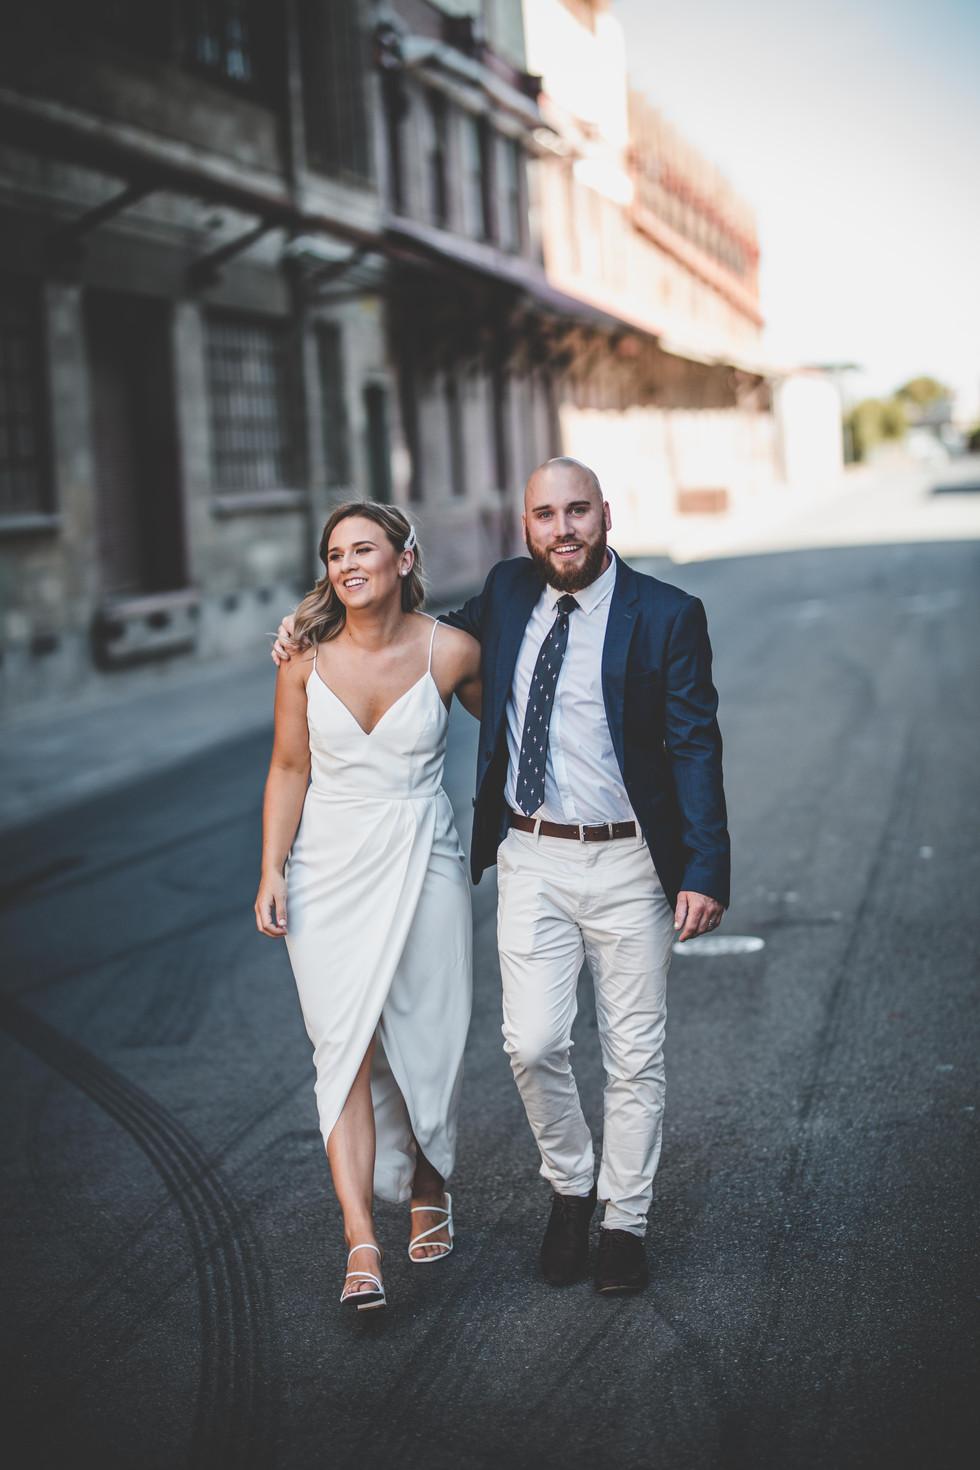 Nick & Olivia